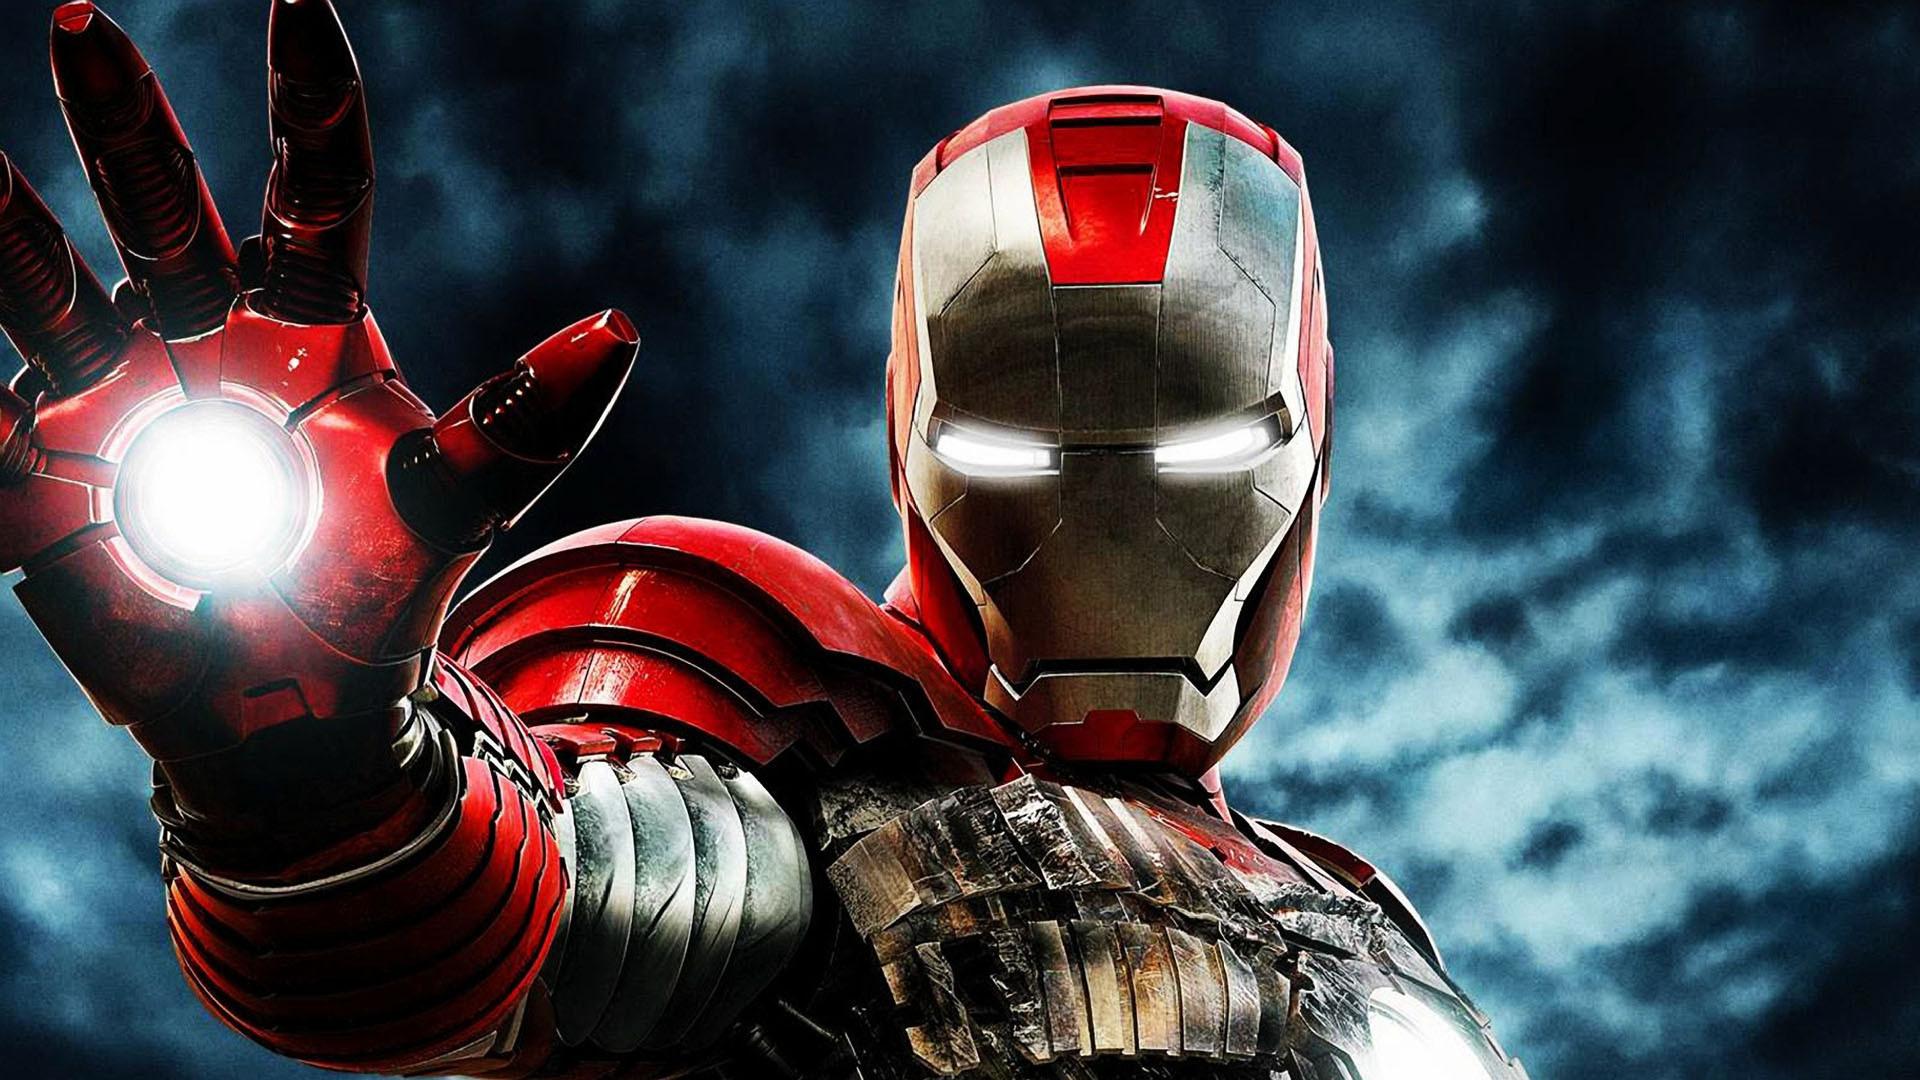 Iron man 2 wallpaper 7 voltagebd Gallery